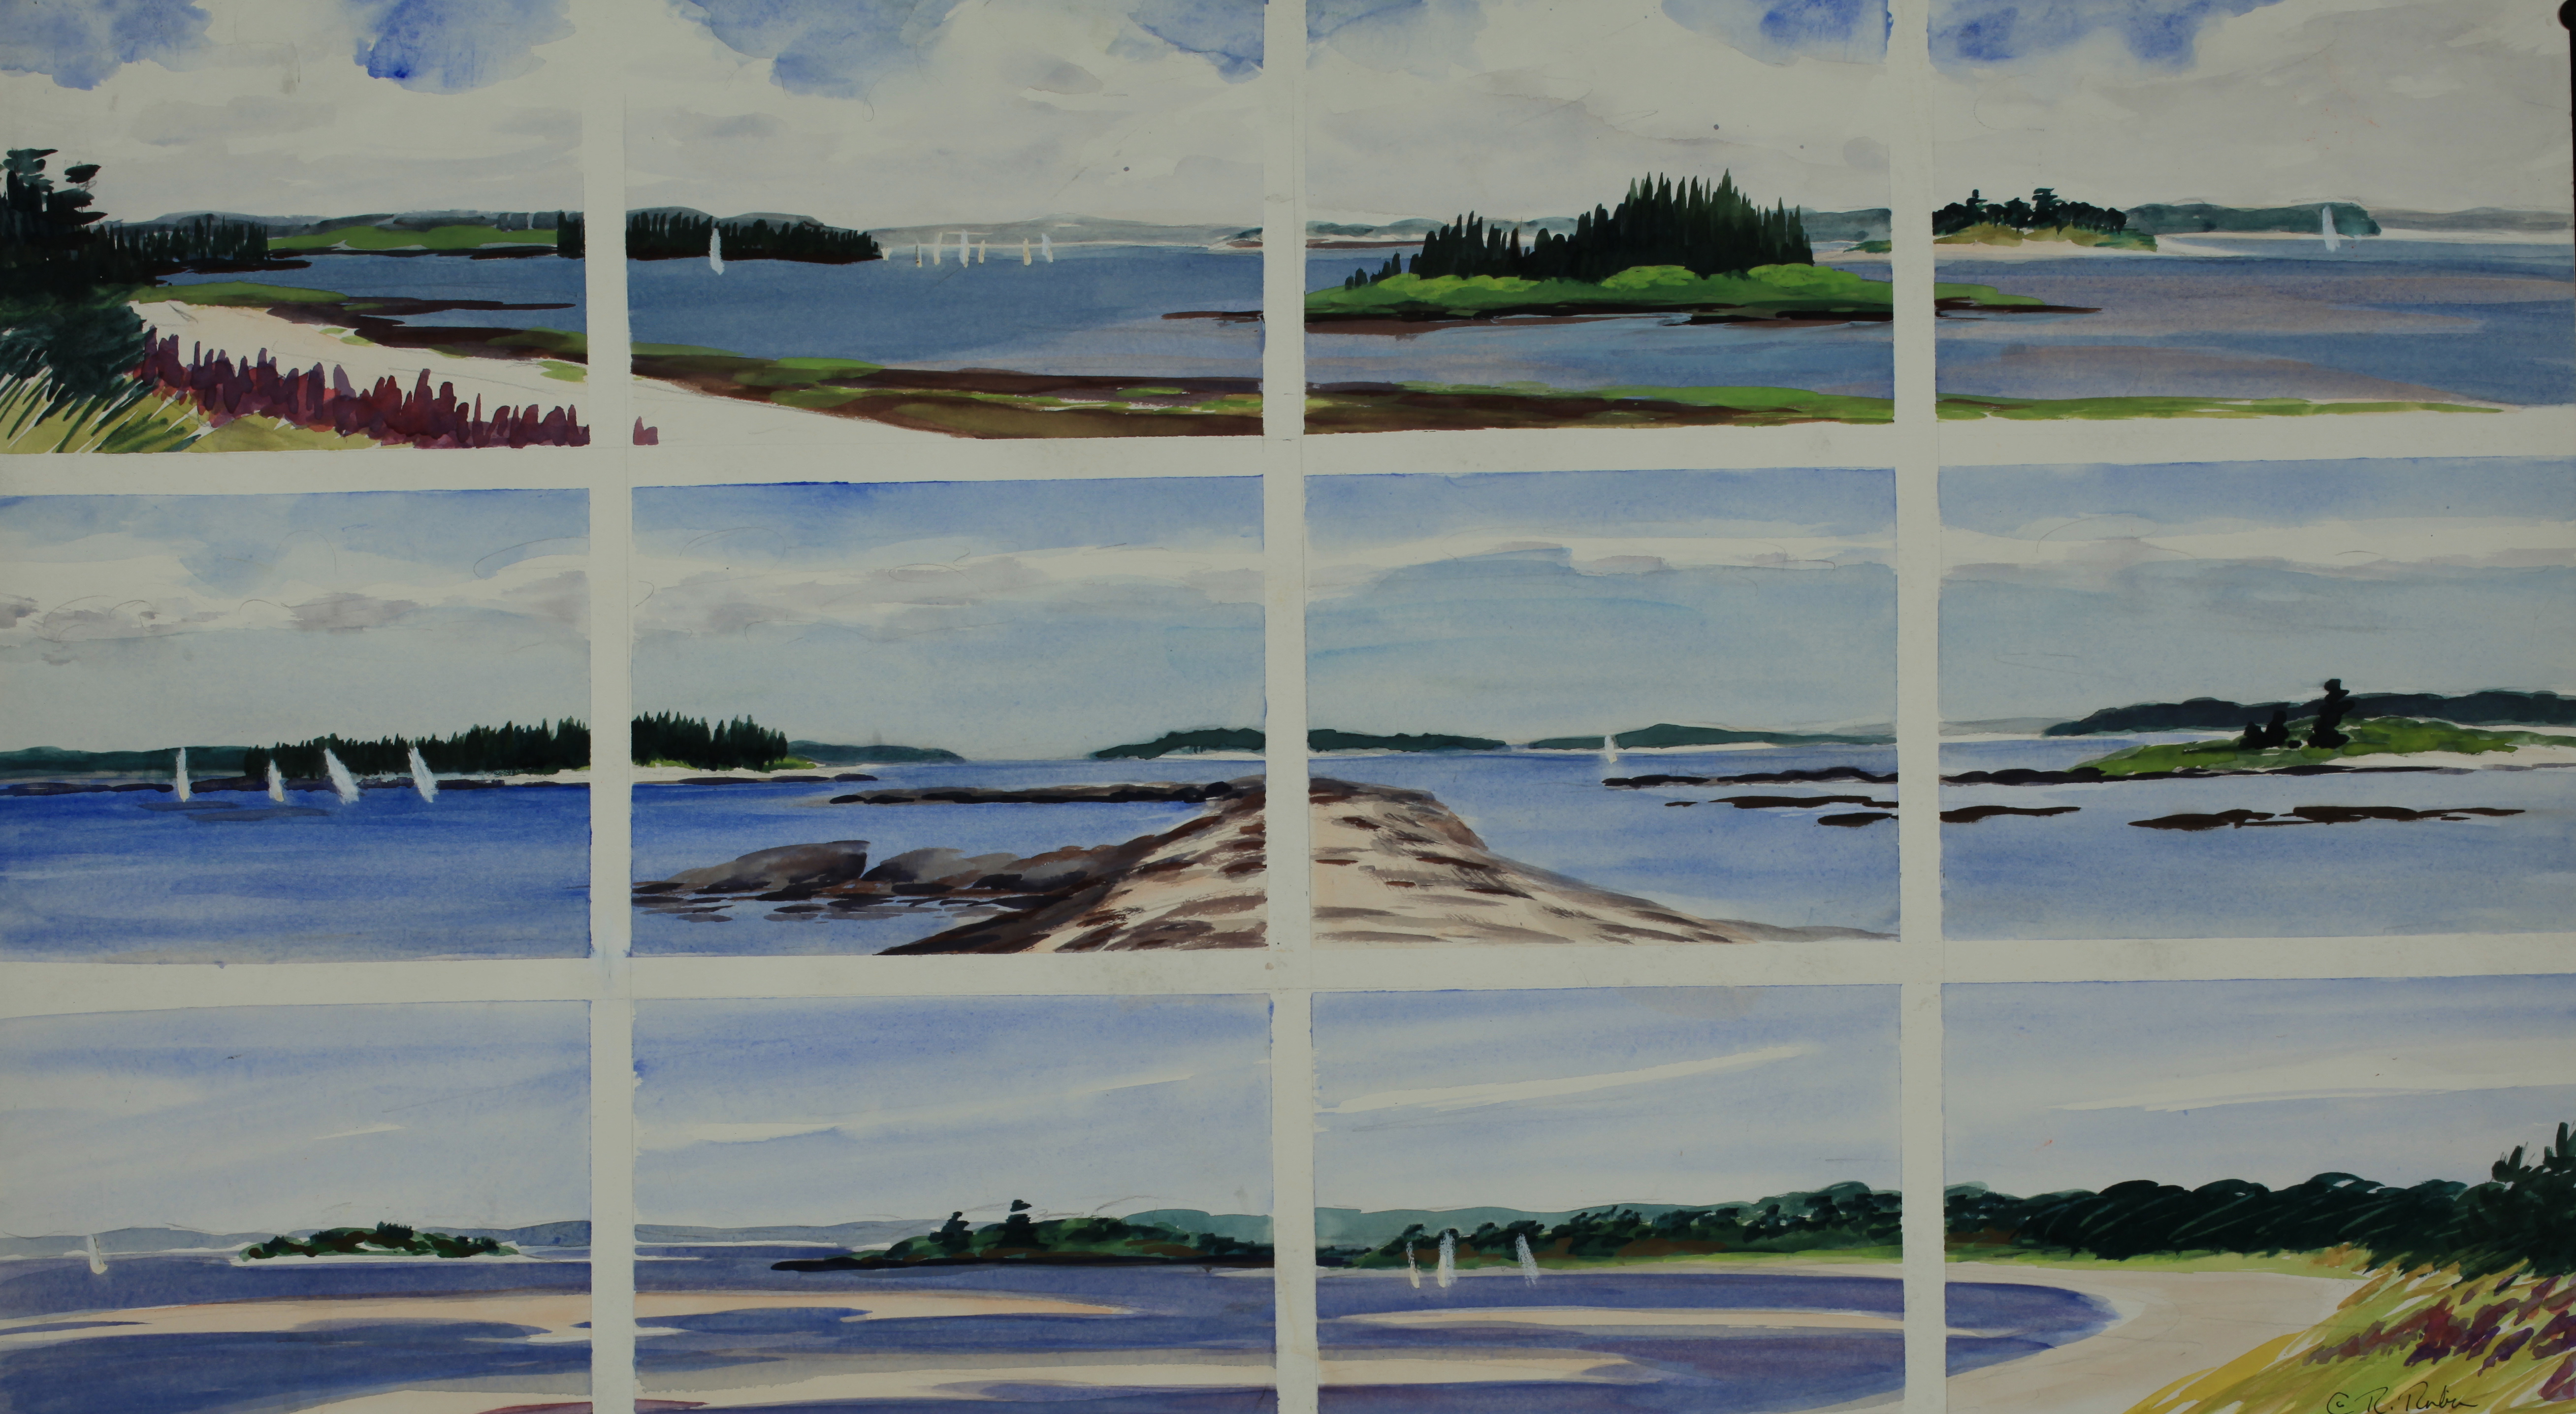 renee-rubin-window-series-img_0588